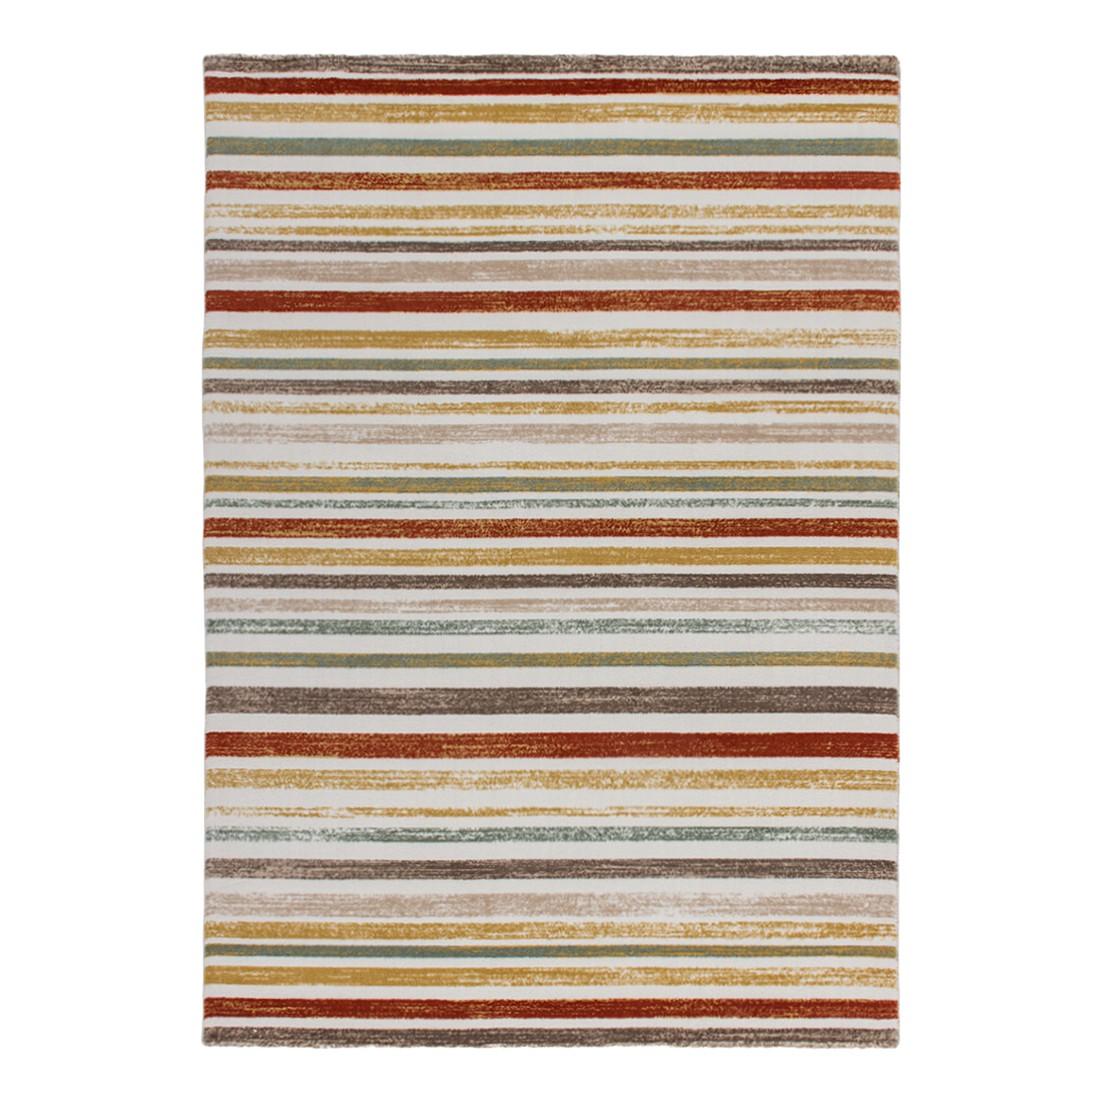 Teppich Mexico – Mexiko-Stadt – Beige – 80 x 300 cm, Kayoom jetzt kaufen